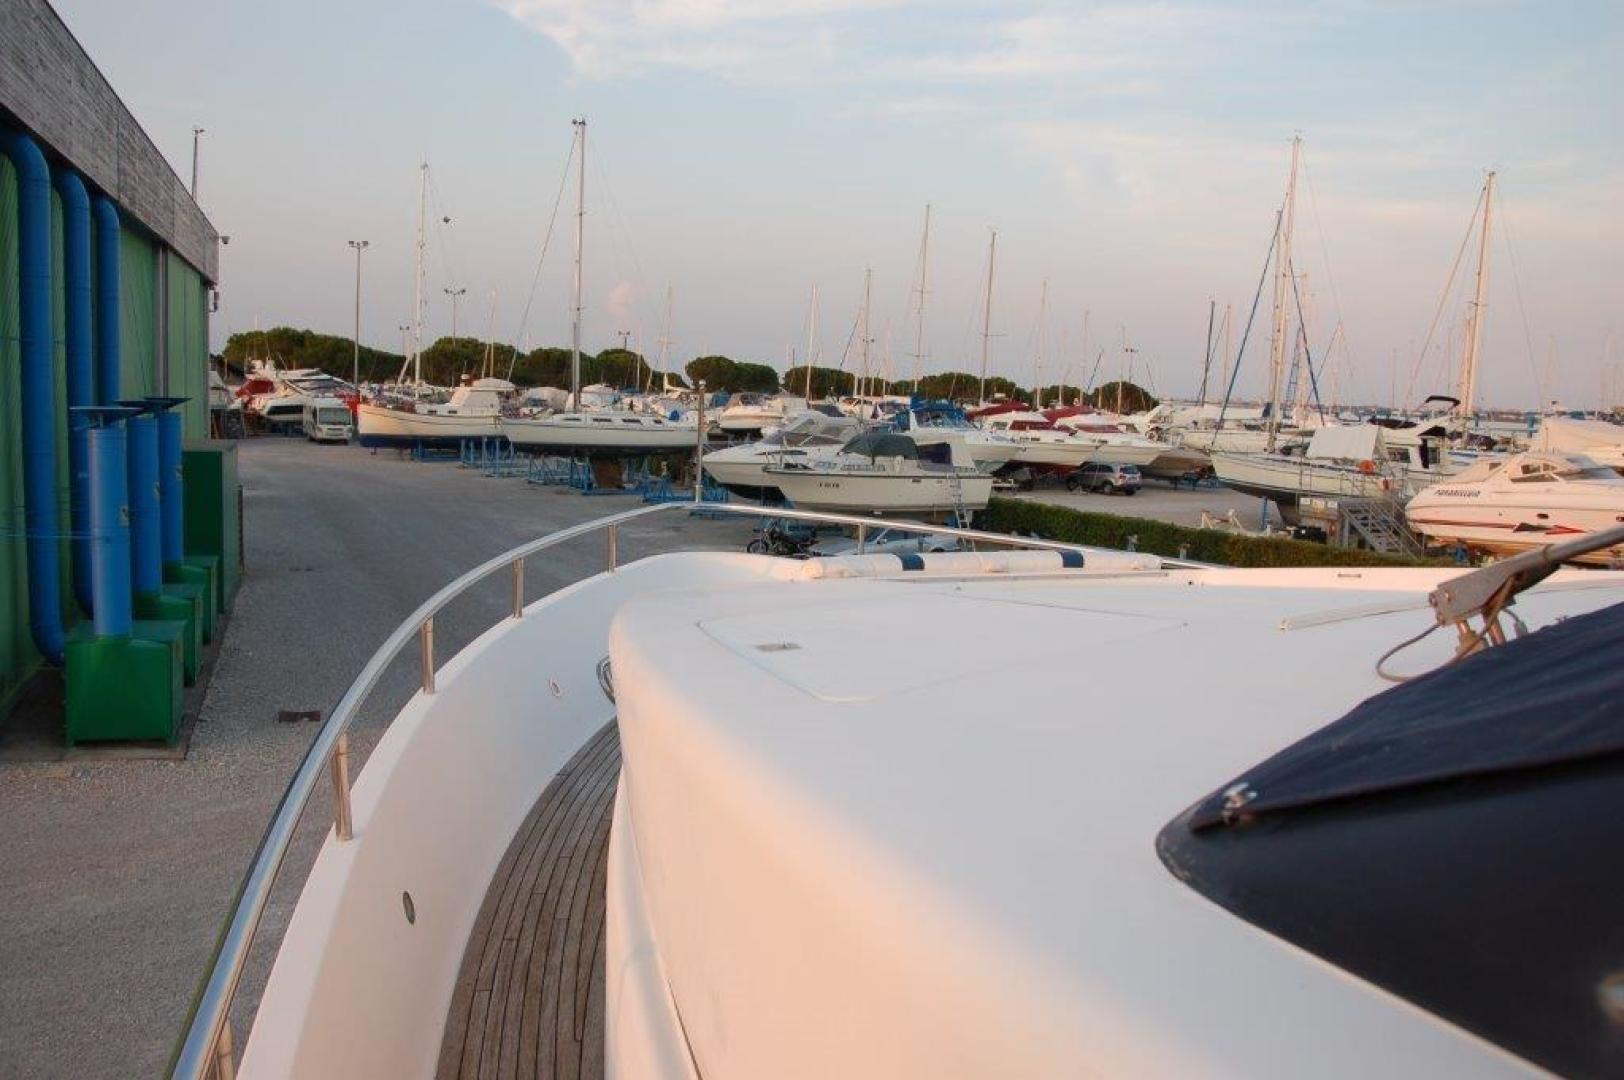 Elegance-70 Motor Yacht 1998 -Italy-1171281 | Thumbnail